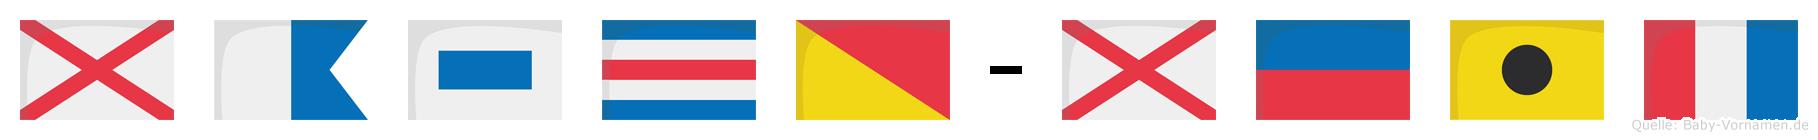 Vasco-Veit im Flaggenalphabet